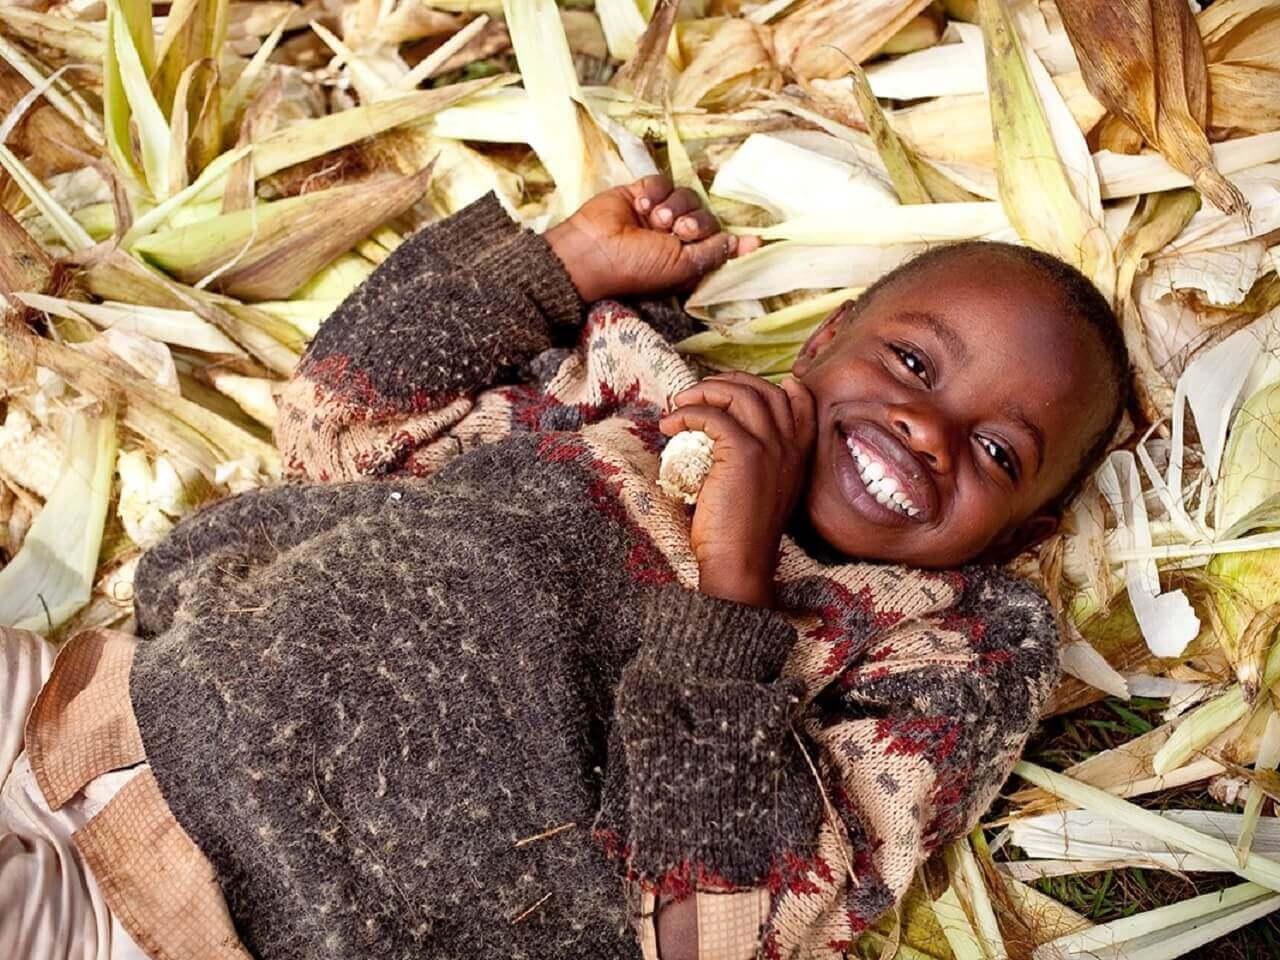 child lying in a field